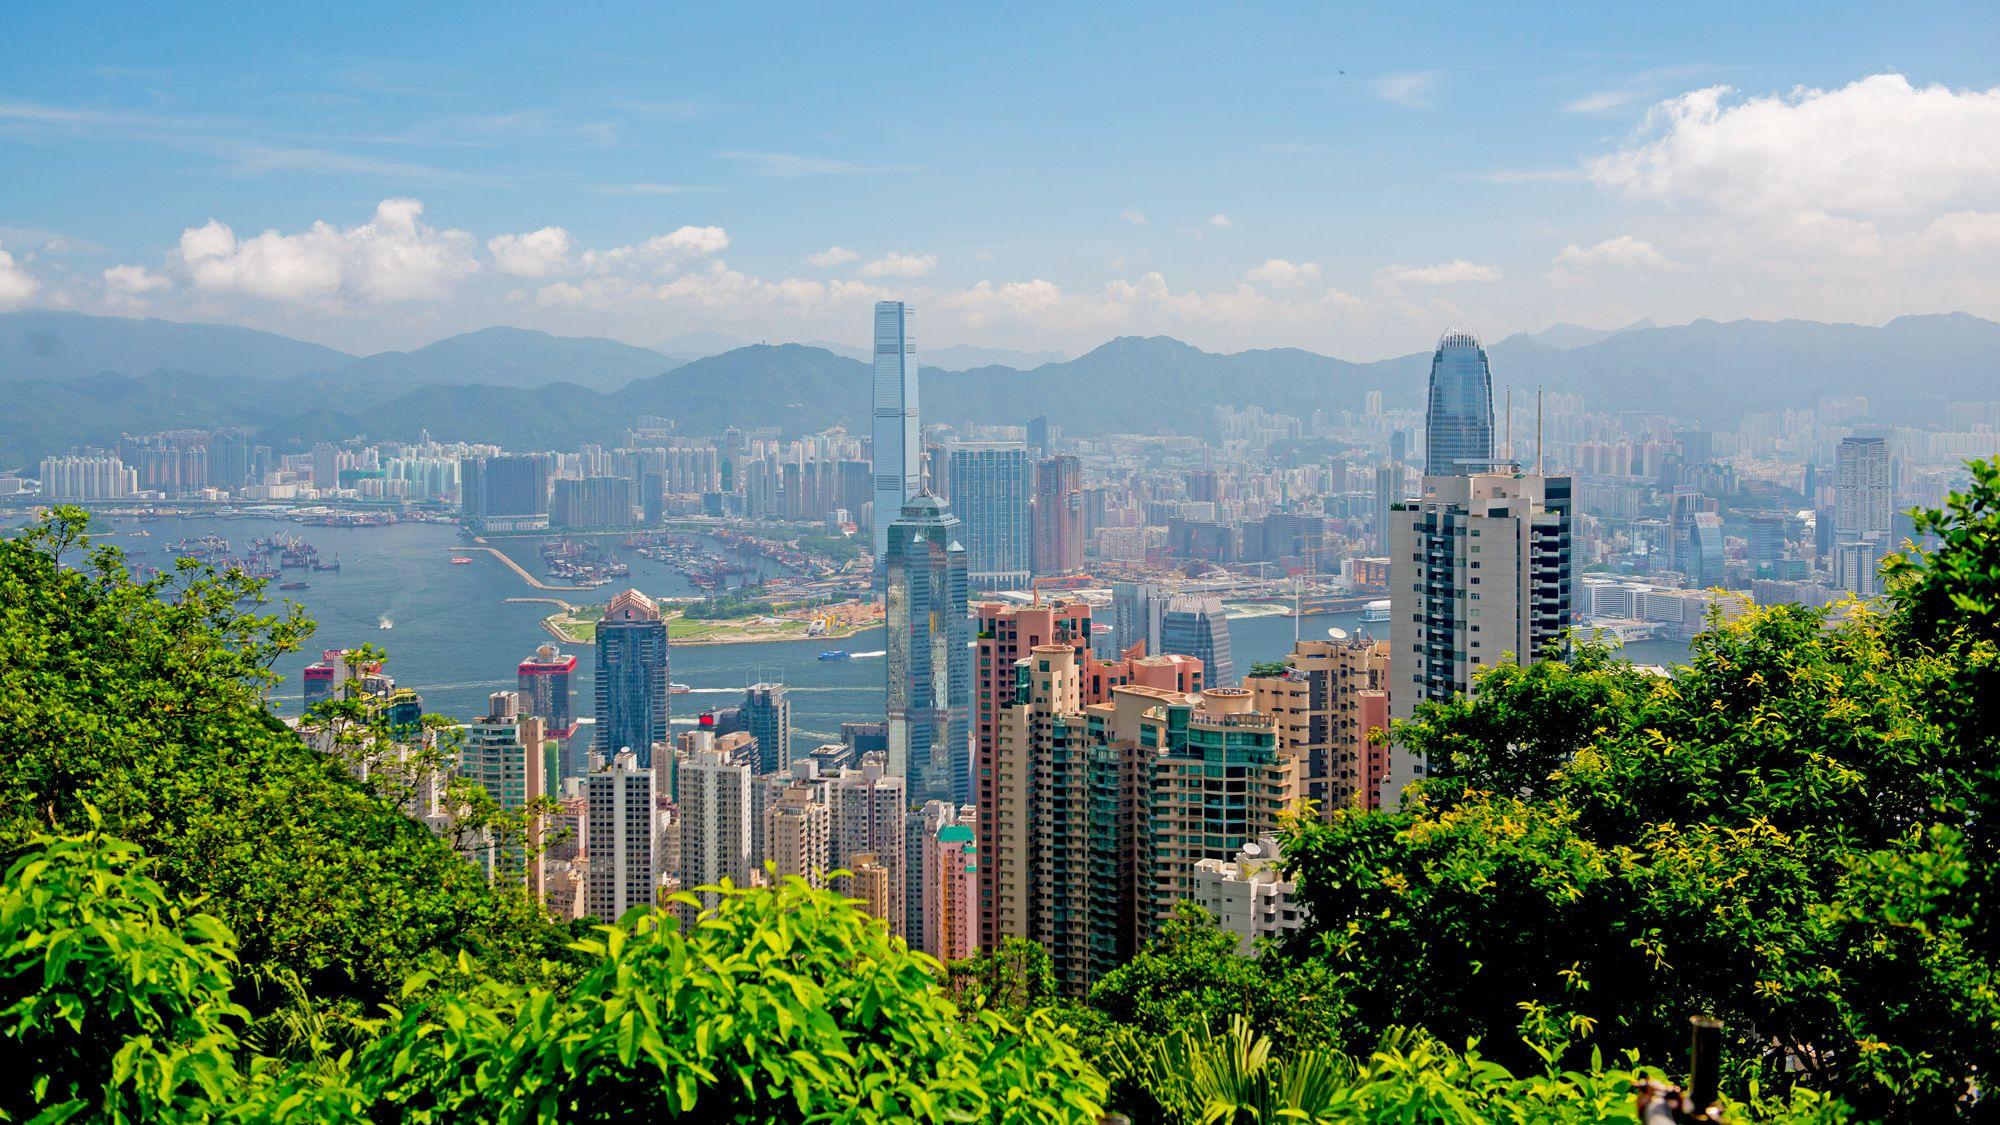 Skip-the-Line The Peak Tram & Hong Kong Morning Island Tour